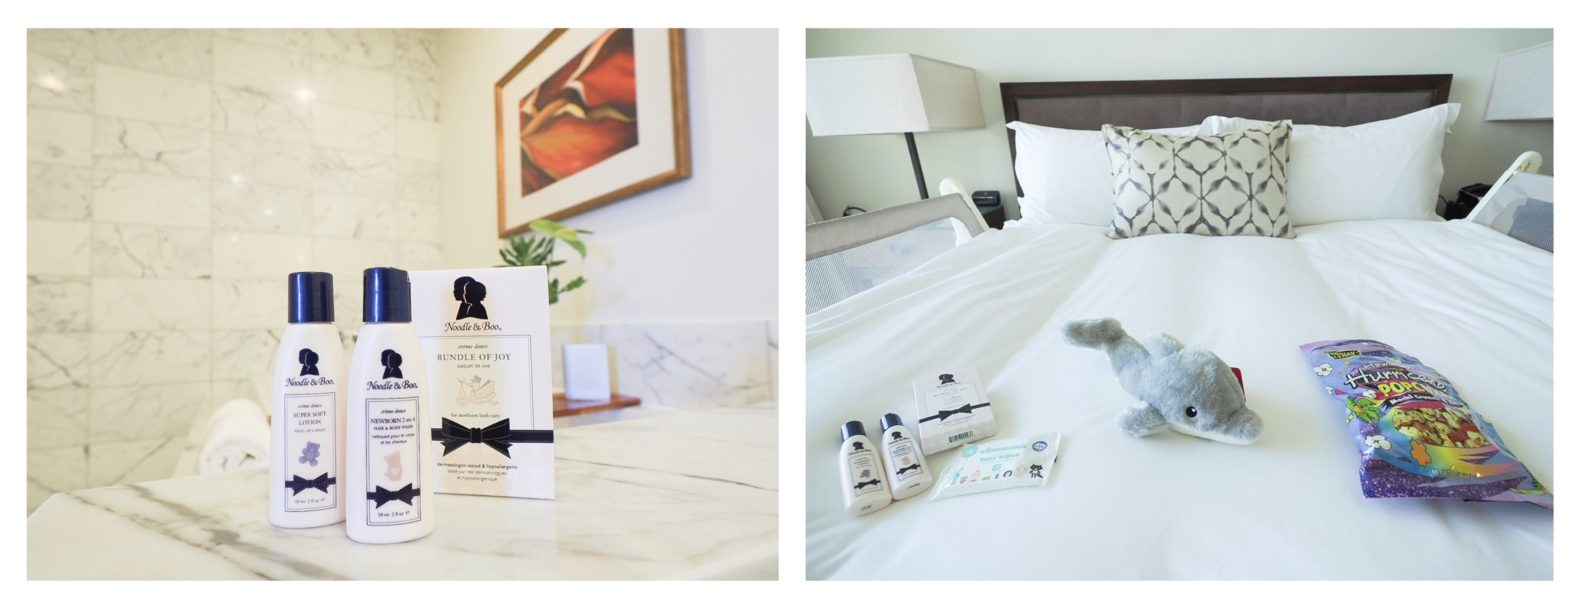 img 5012 - Trump International Hotel Waikiki - ファミリーステイに大満足!トランプ インターナショナル ホテルステイ